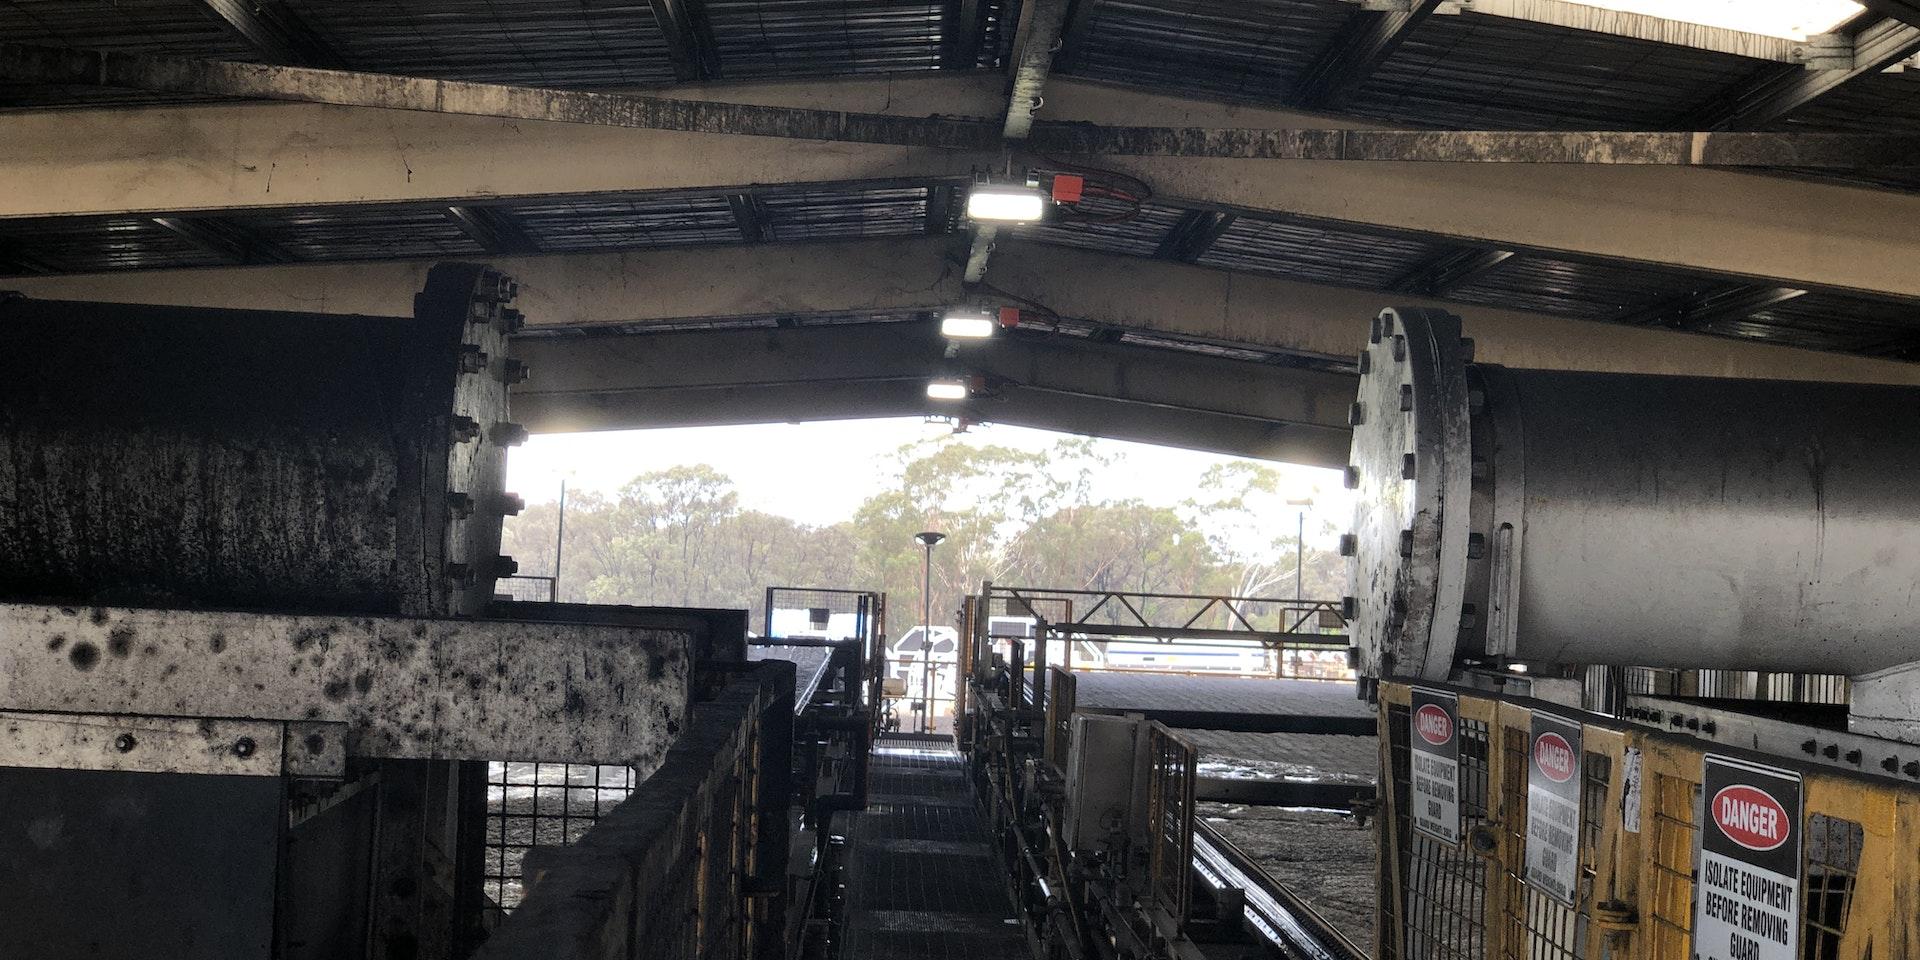 DLK LED Conveyor / Area Light in application